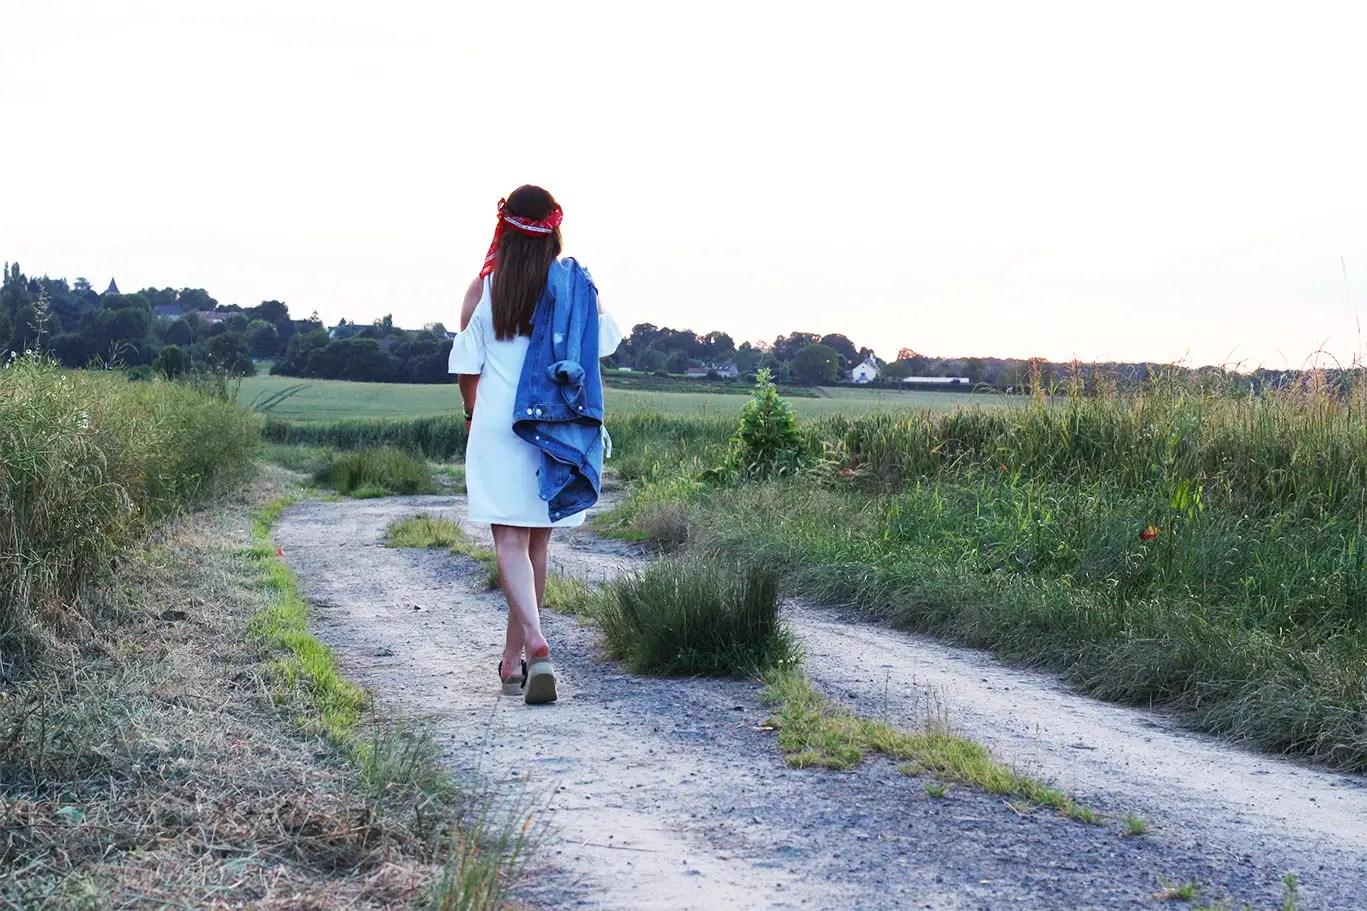 robe blanche, robe zara, col bardot, bandana, hipanema, pull and bear, sandales compensées, blog mode, blogueuse mode, fashion blogger, country outfit